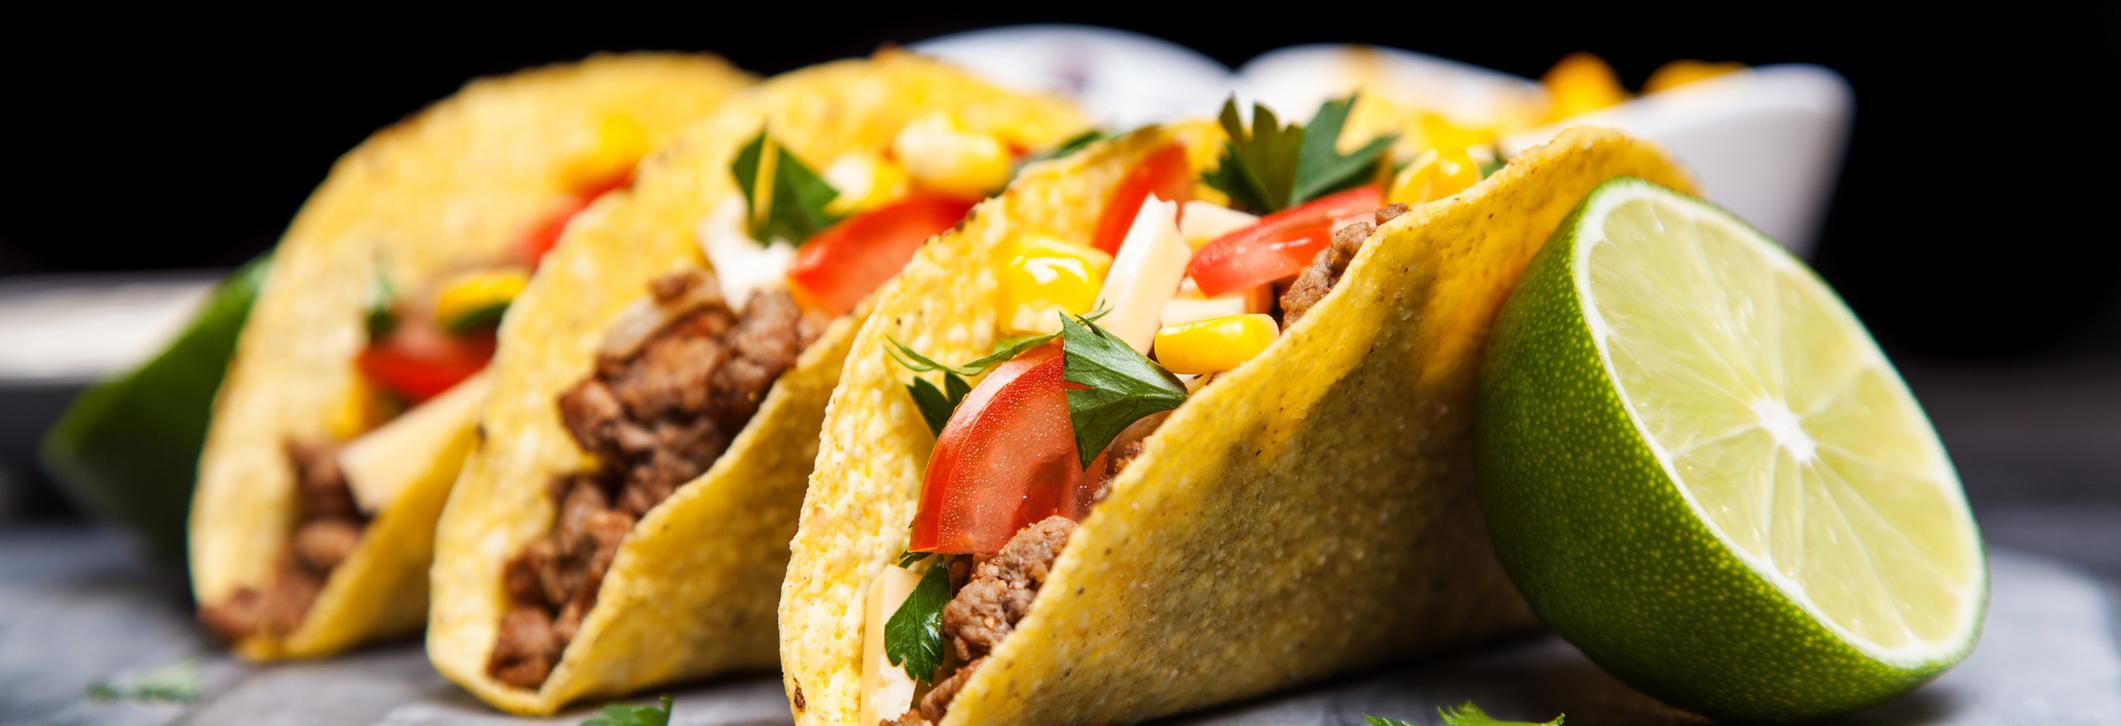 tacos mexican food los reyes mexican restaurant kettering ohio